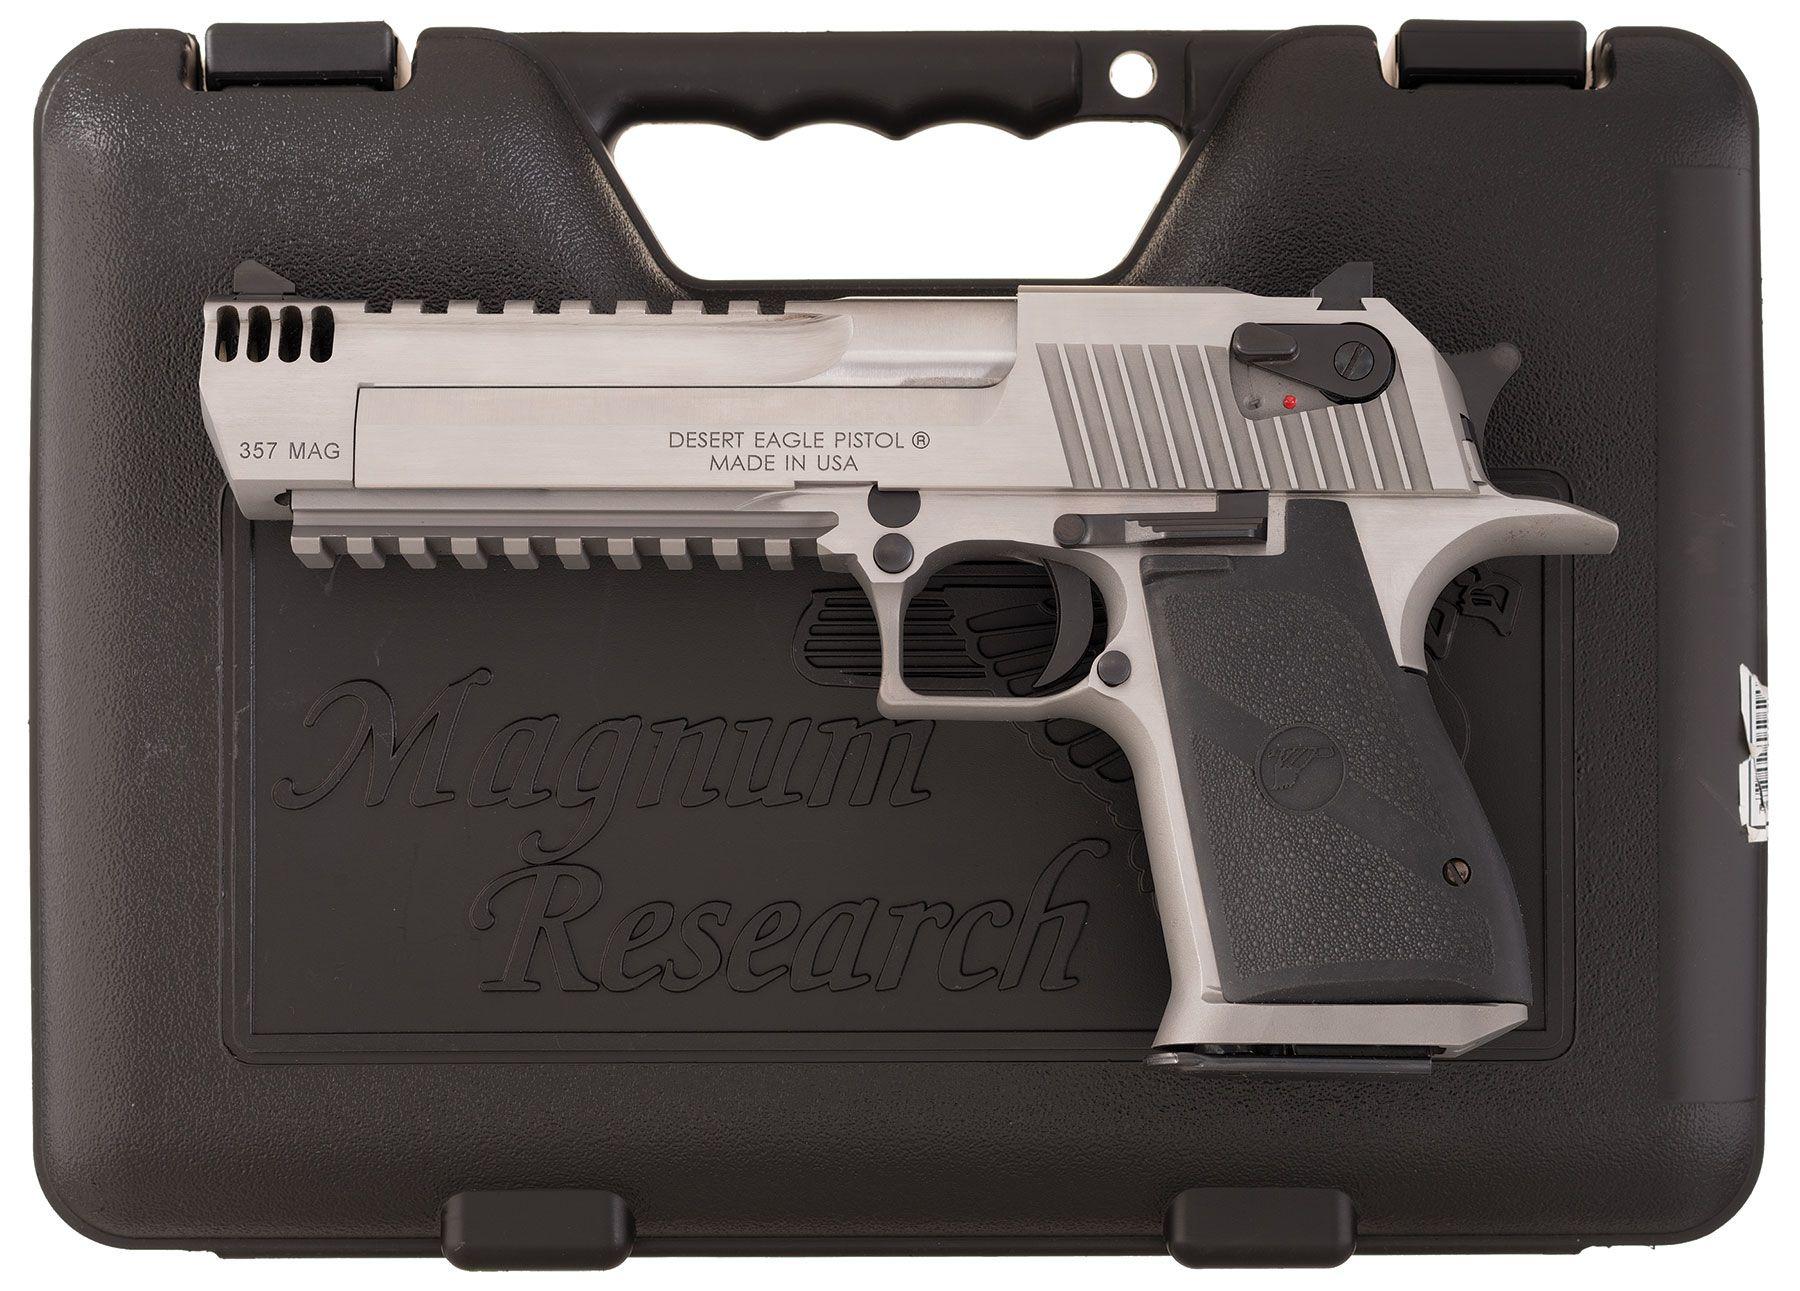 Desert Eagle 50AE Federdruck Kaliber 6mm <0.5 Joule Softair Pistole,  Bicolor, 270 mm: Amazon.de: Sport & Freizeit